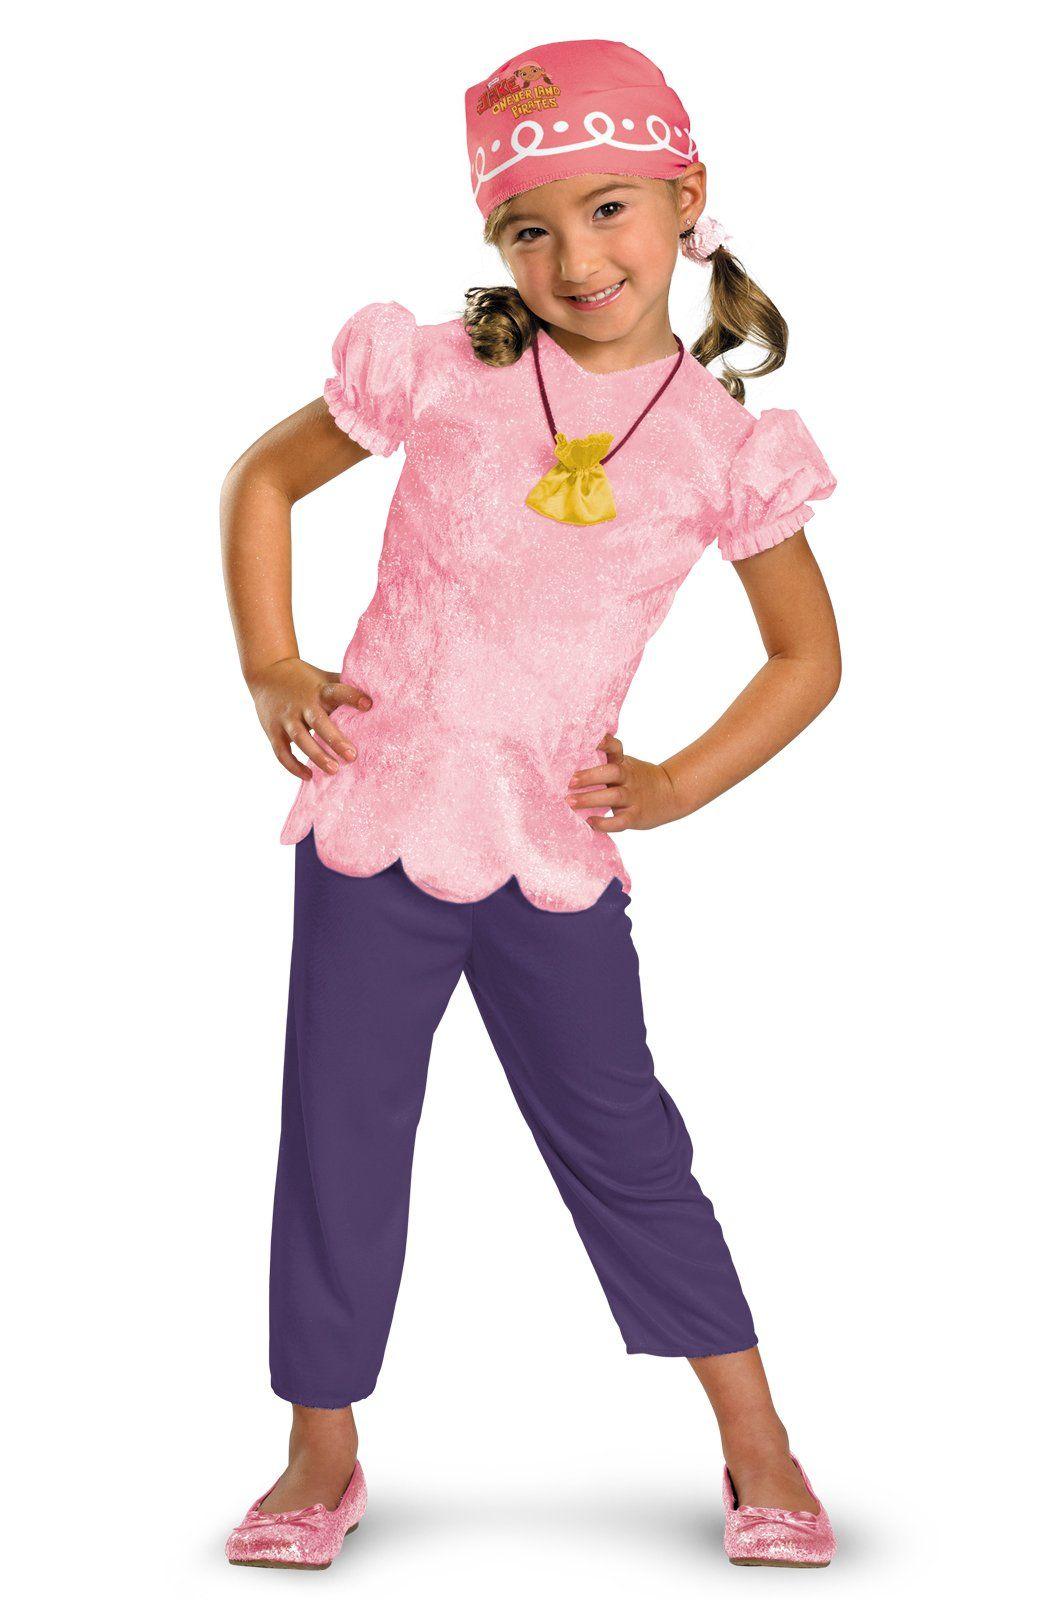 Izzy Tutu Jake Neverland Pirates Fancy Dress Up Halloween Deluxe Child Costume